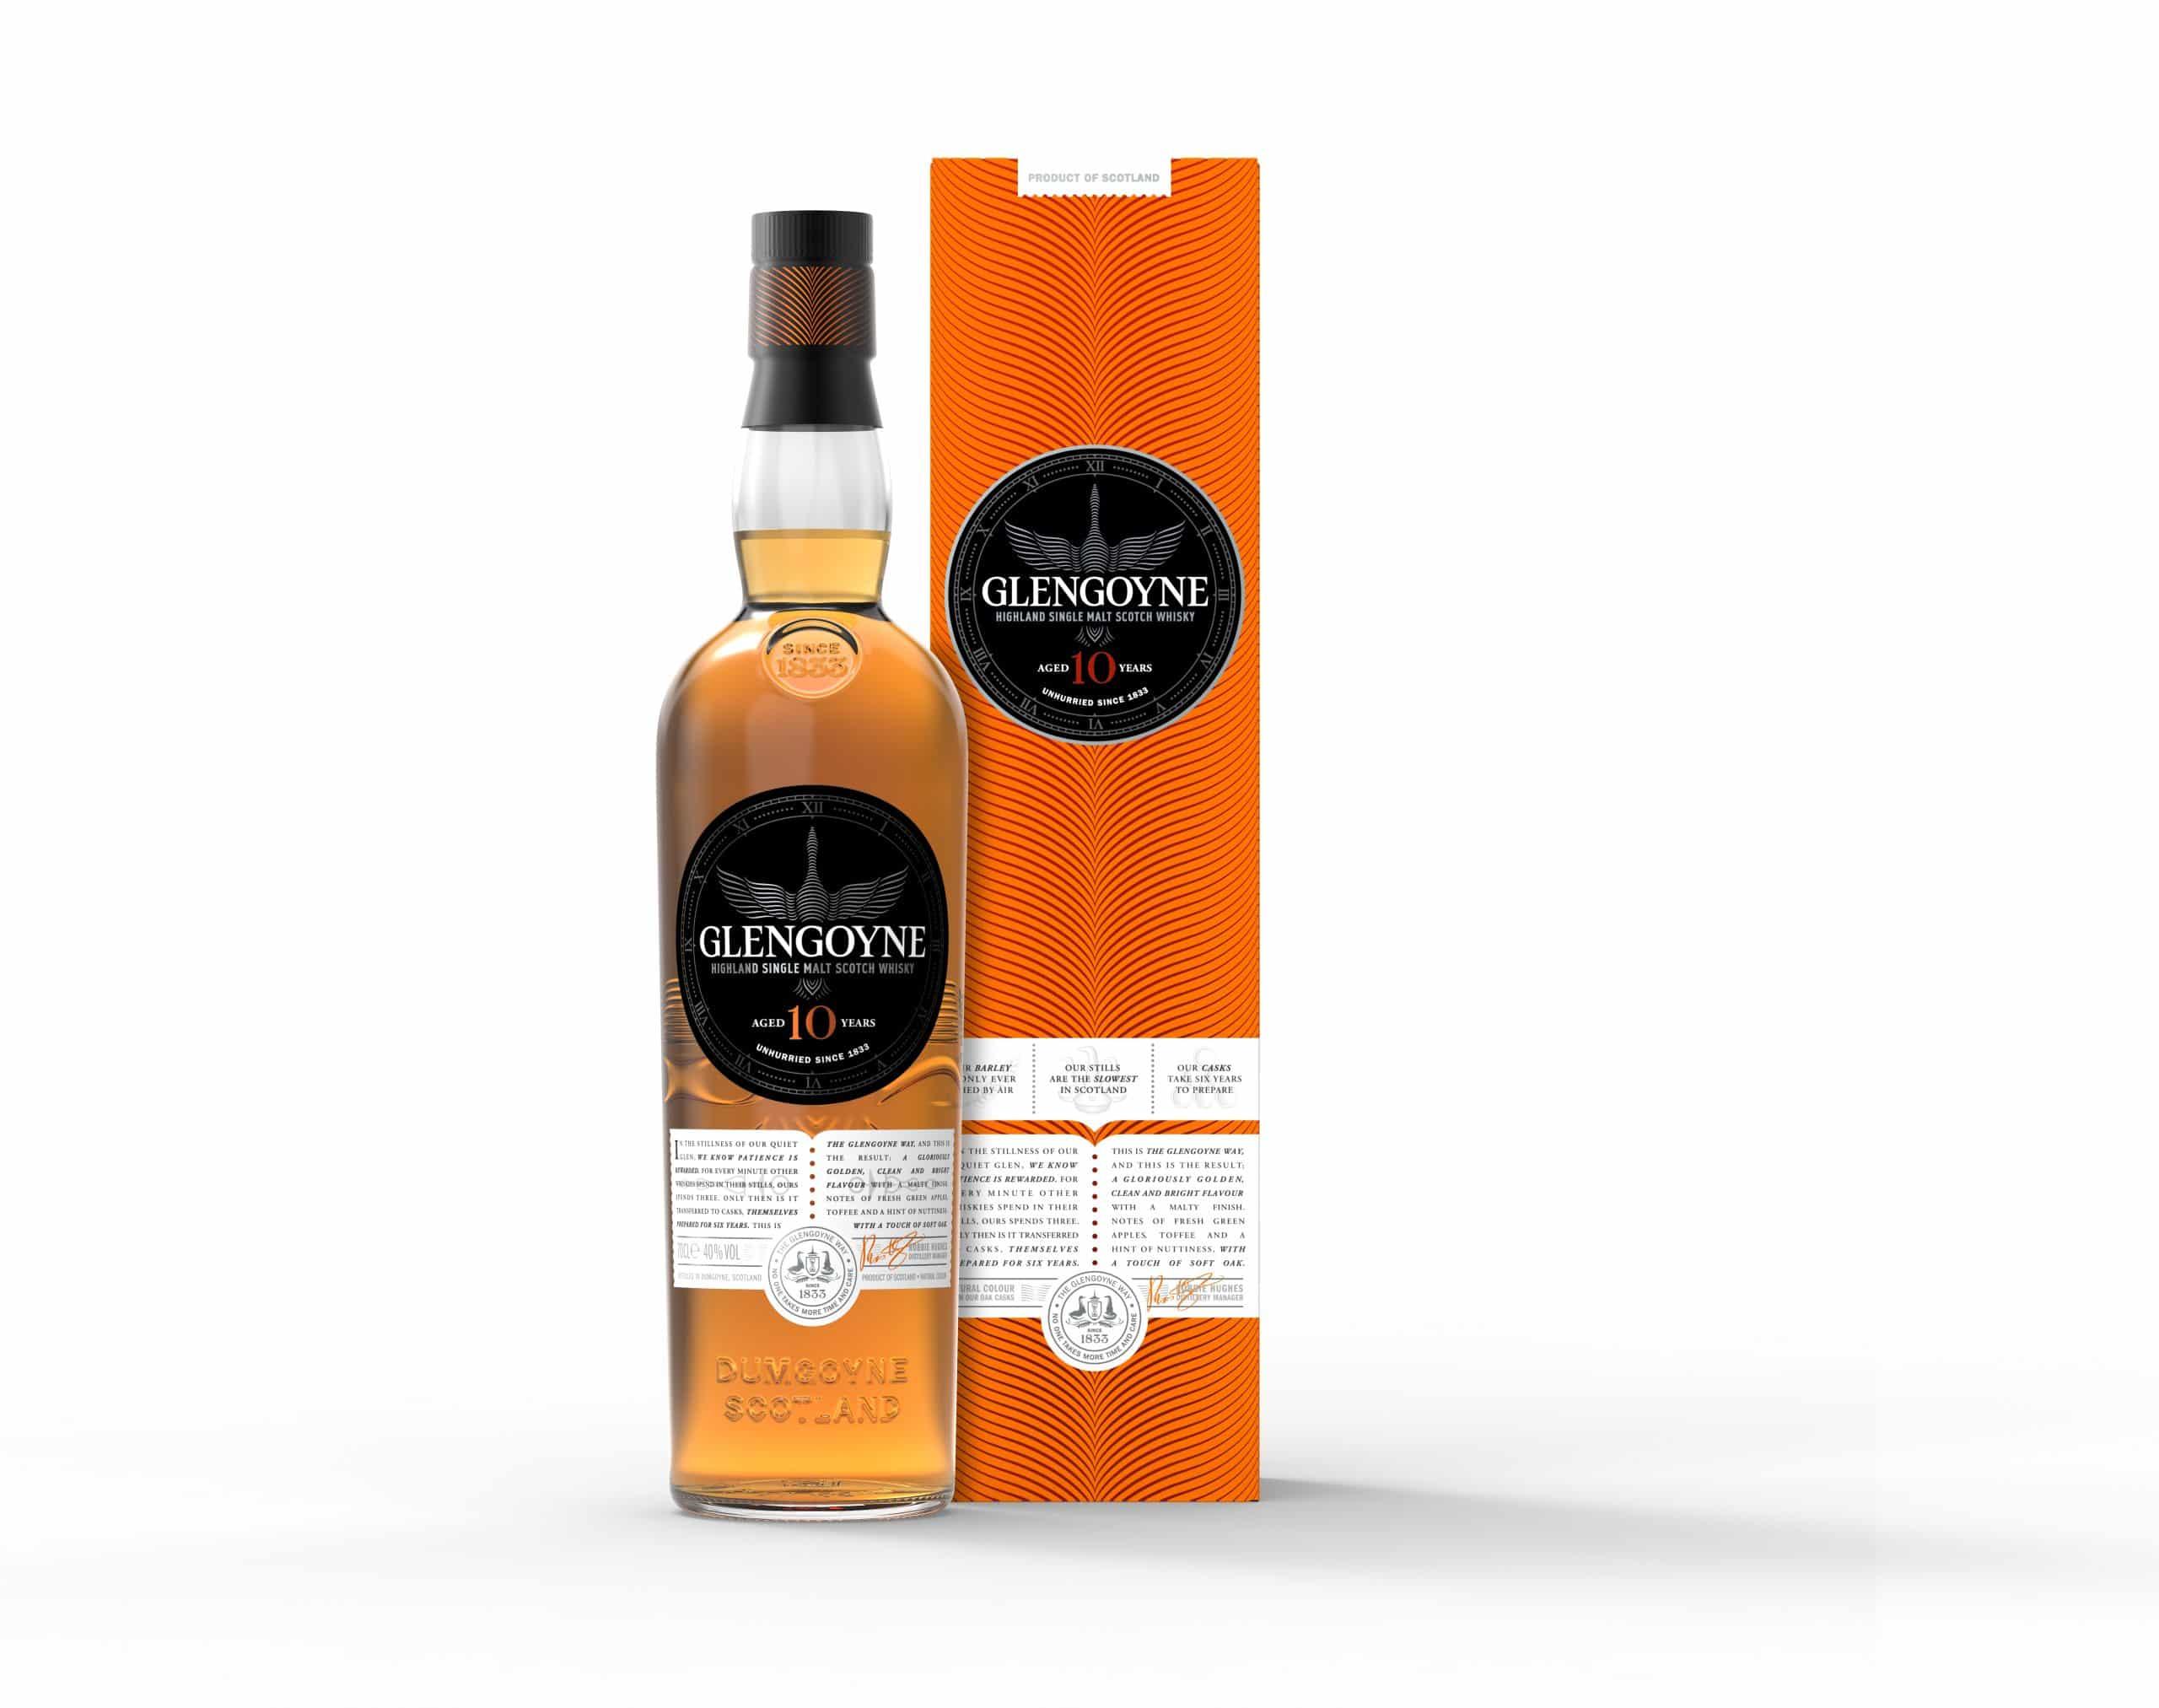 Glengoyne 12yo Single Malt Scotch Whisky